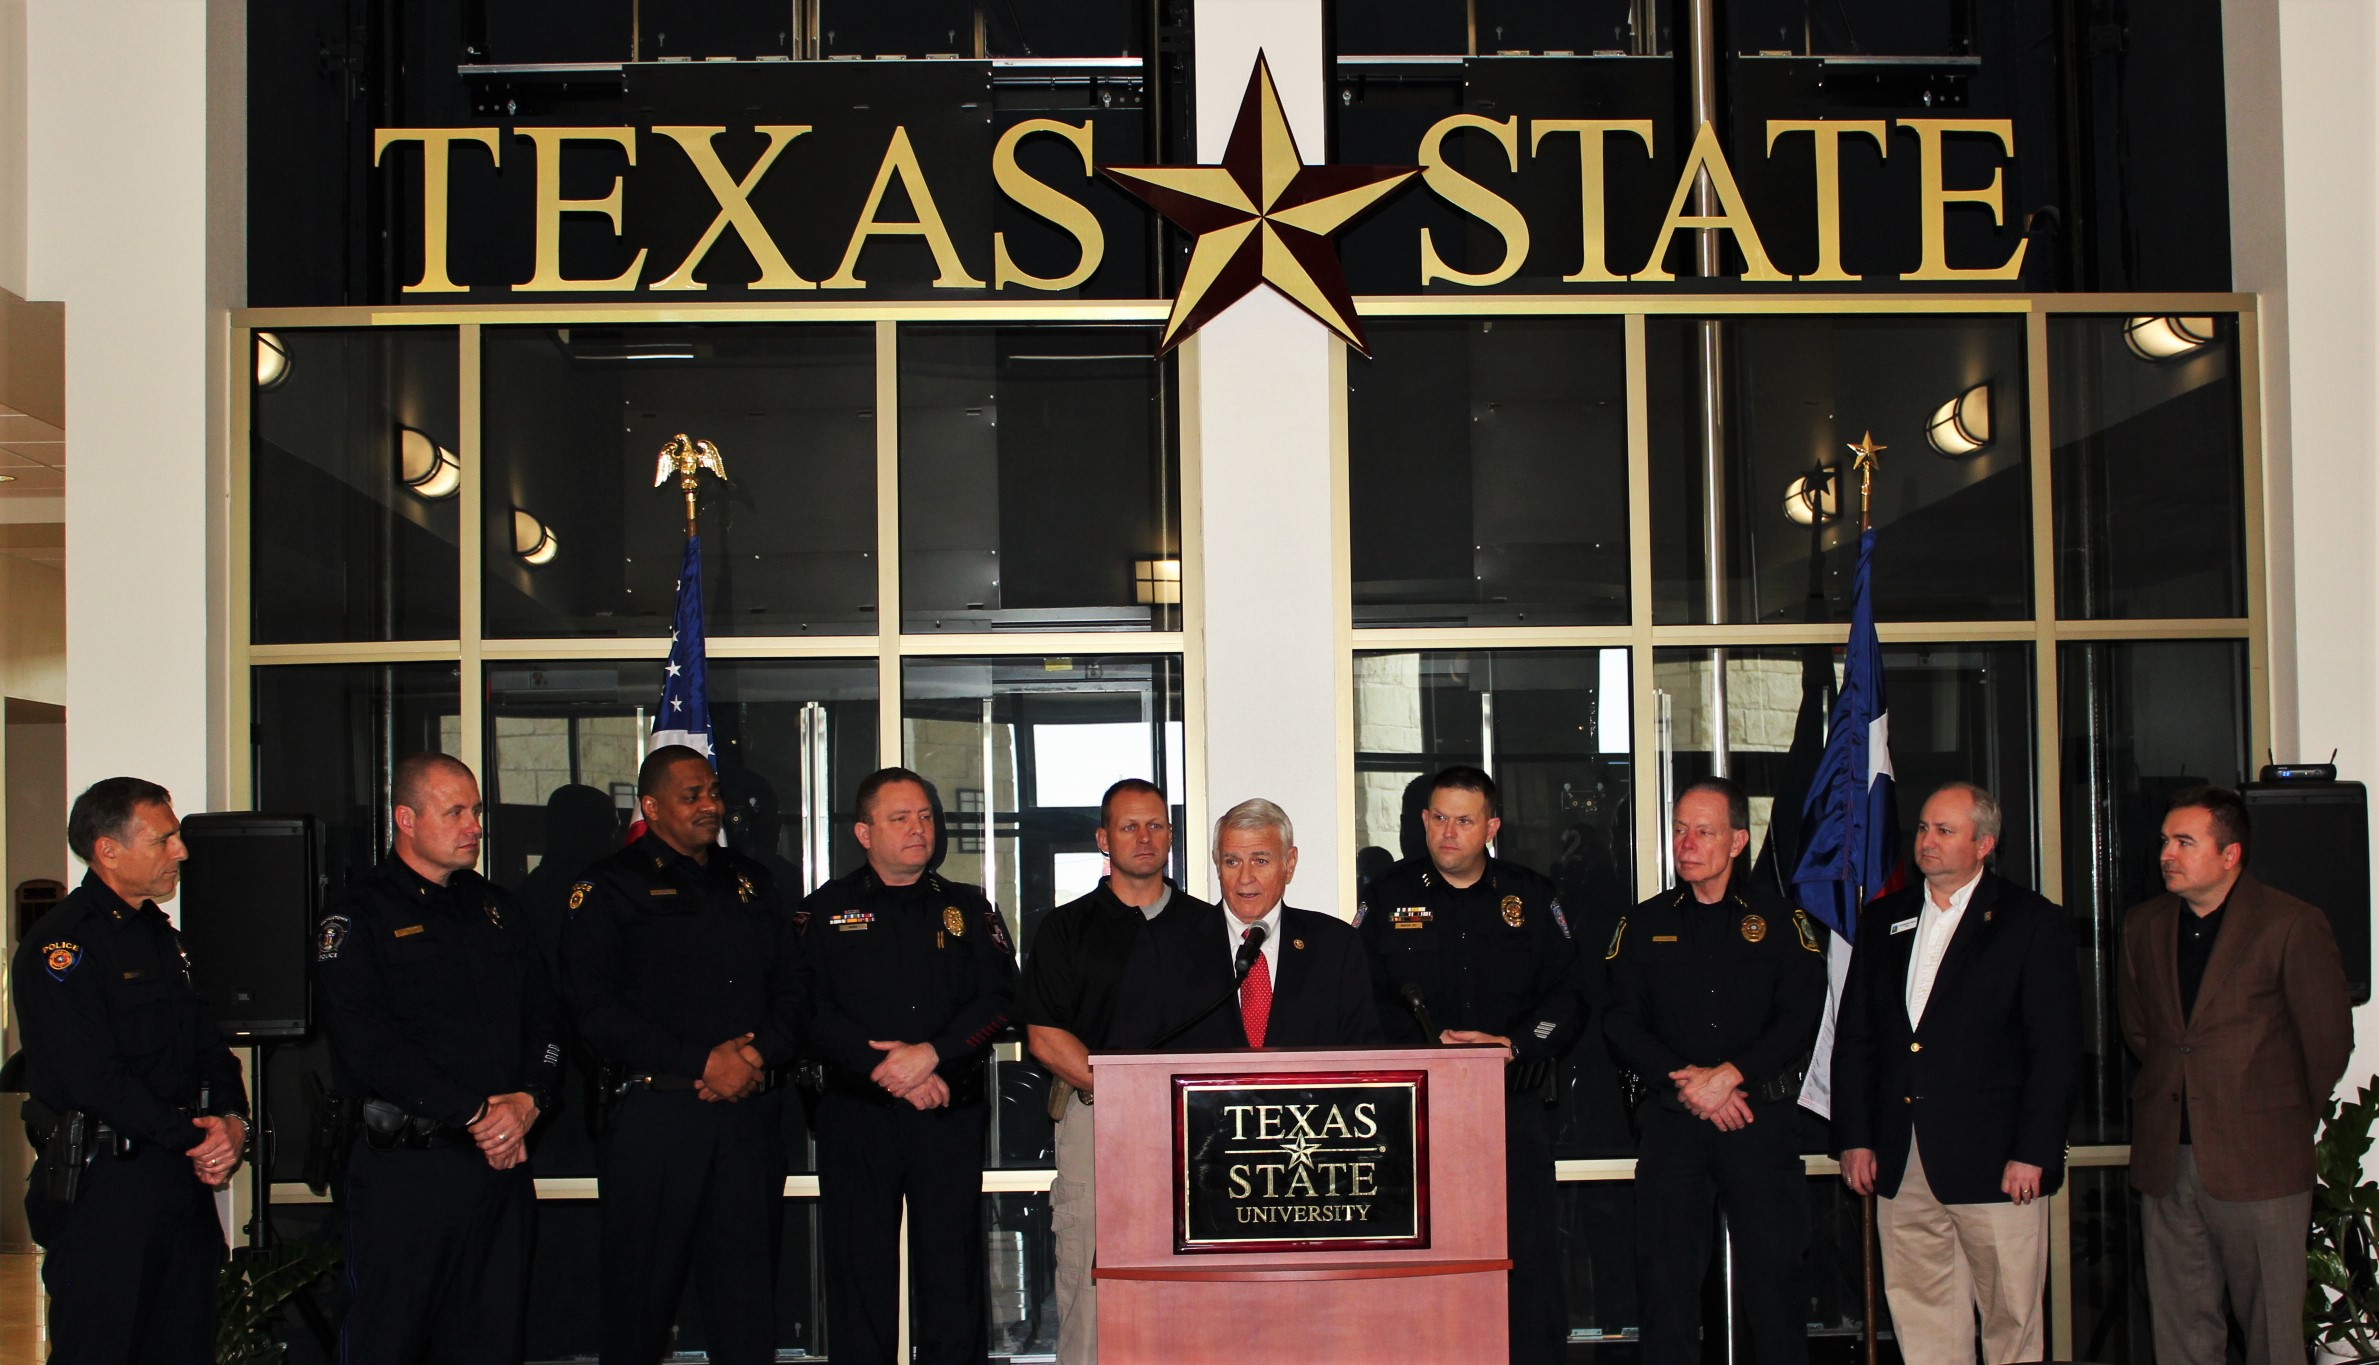 John Carter at Texas State_247930